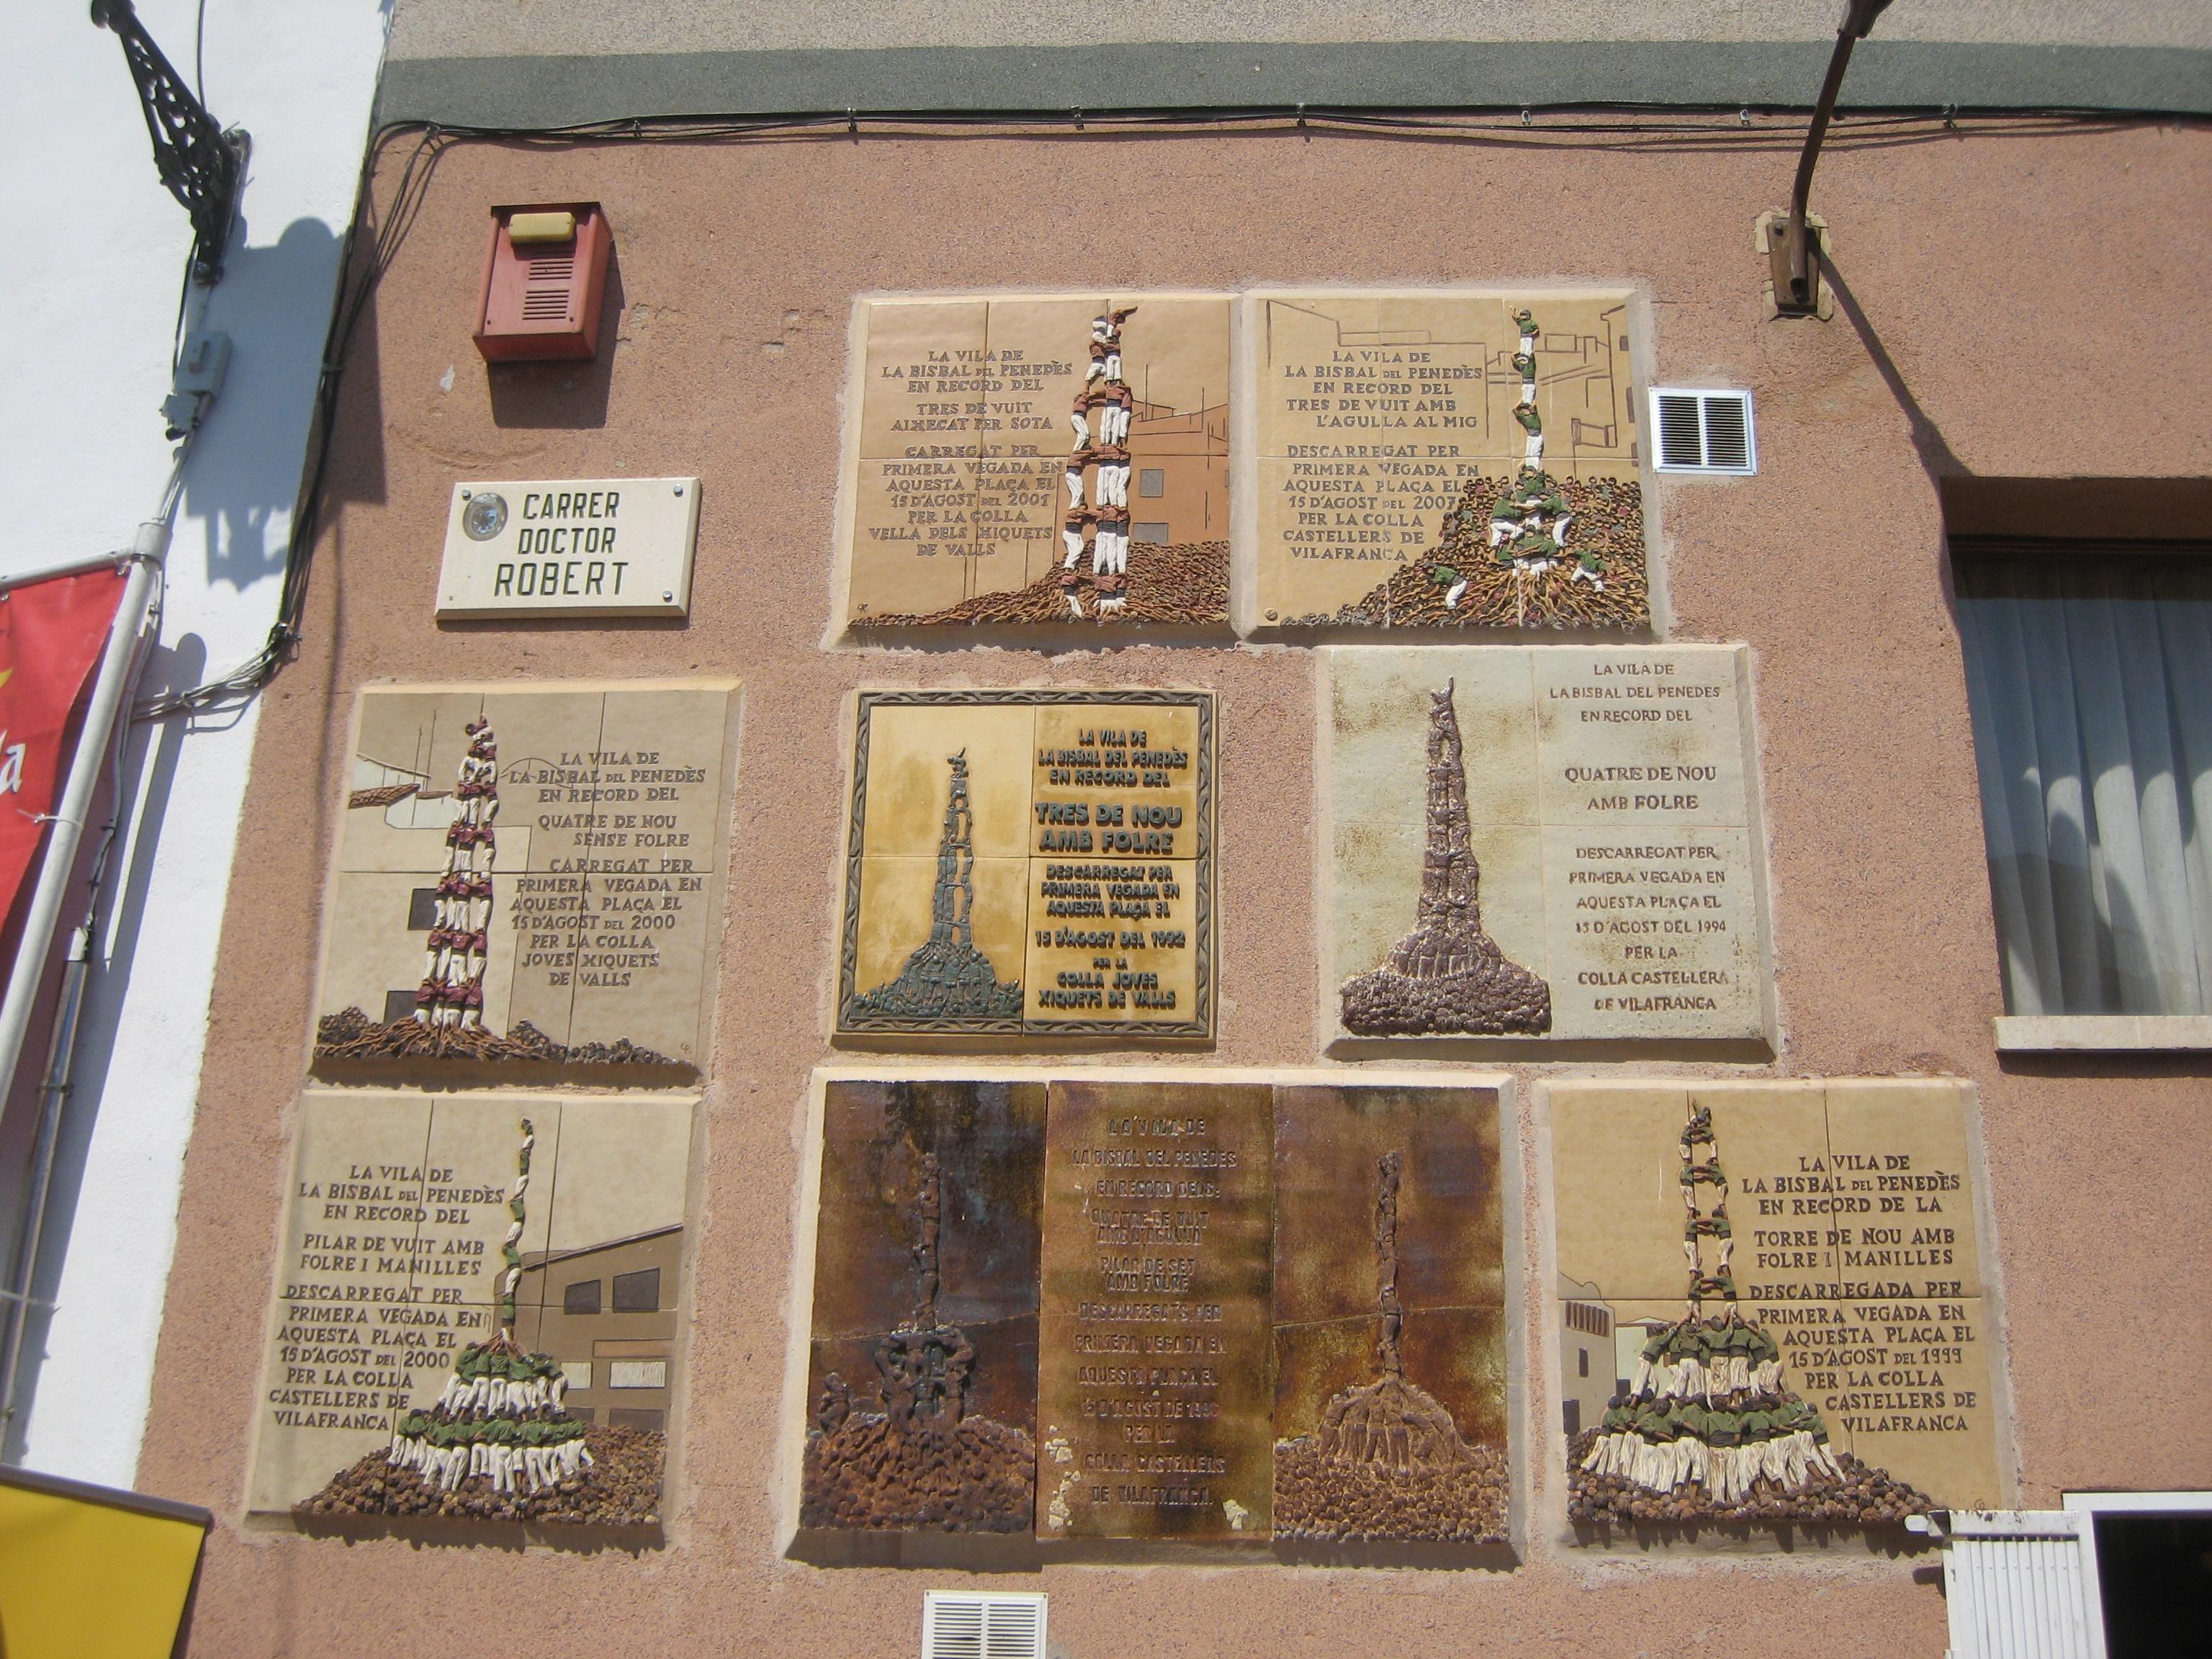 Archivo:Plaques Commemoratives De Fites Castelleres   La Bisbal Del Penedès .JPG